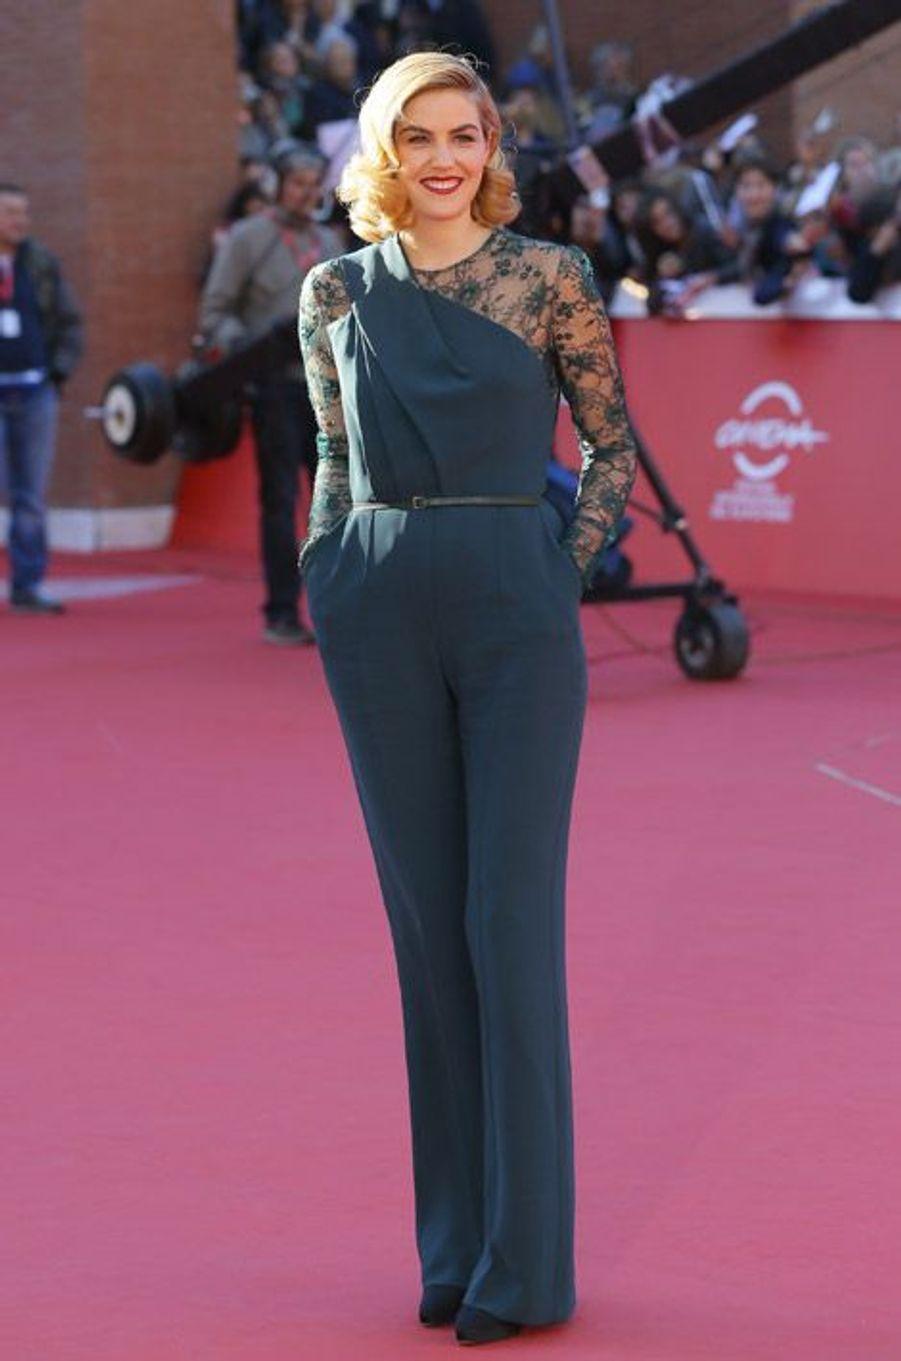 La fille de Kevin Costner, Lily Costner, 28 ans, lors du festival du film de Rome, le 24 octobre 2014